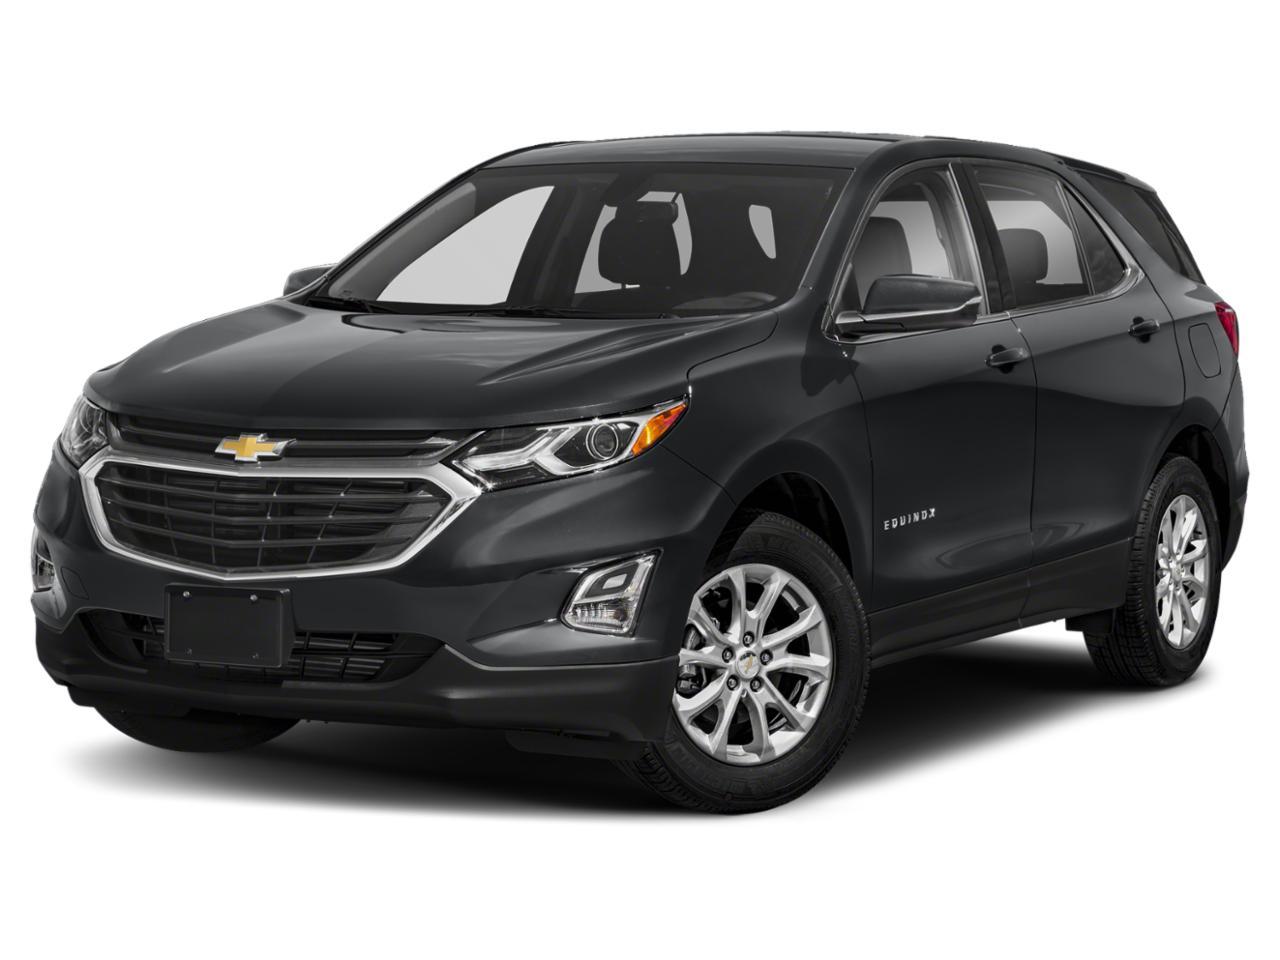 2018 Chevrolet Equinox Vehicle Photo in Neenah, WI 54956